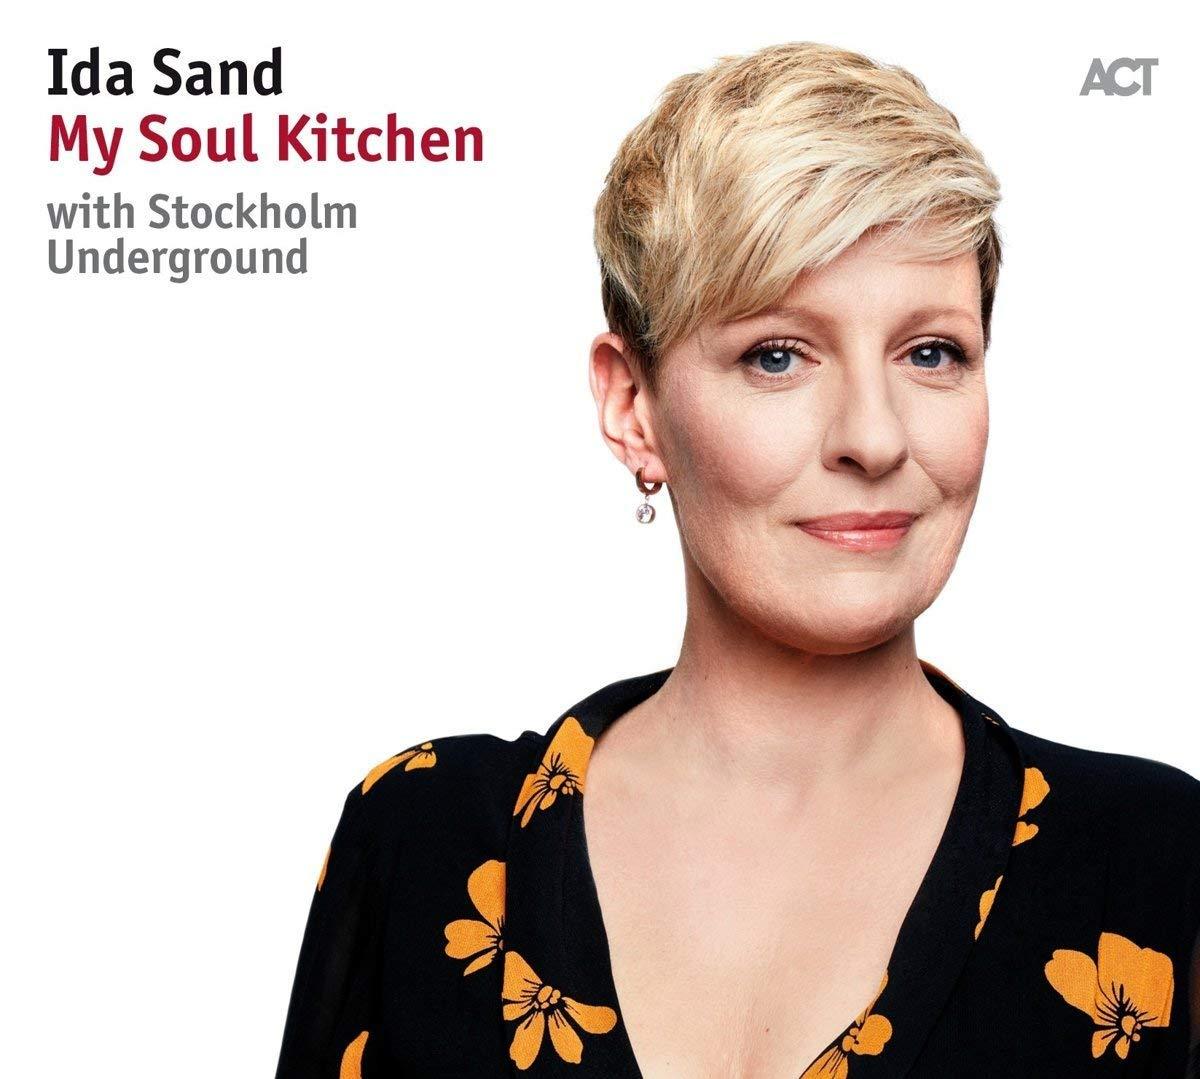 da Sand & Stockholm Underground - My Soul Kitchen [VINYL] LP £5.97 (Prime) / £9.96 (non Prime) at Amazon